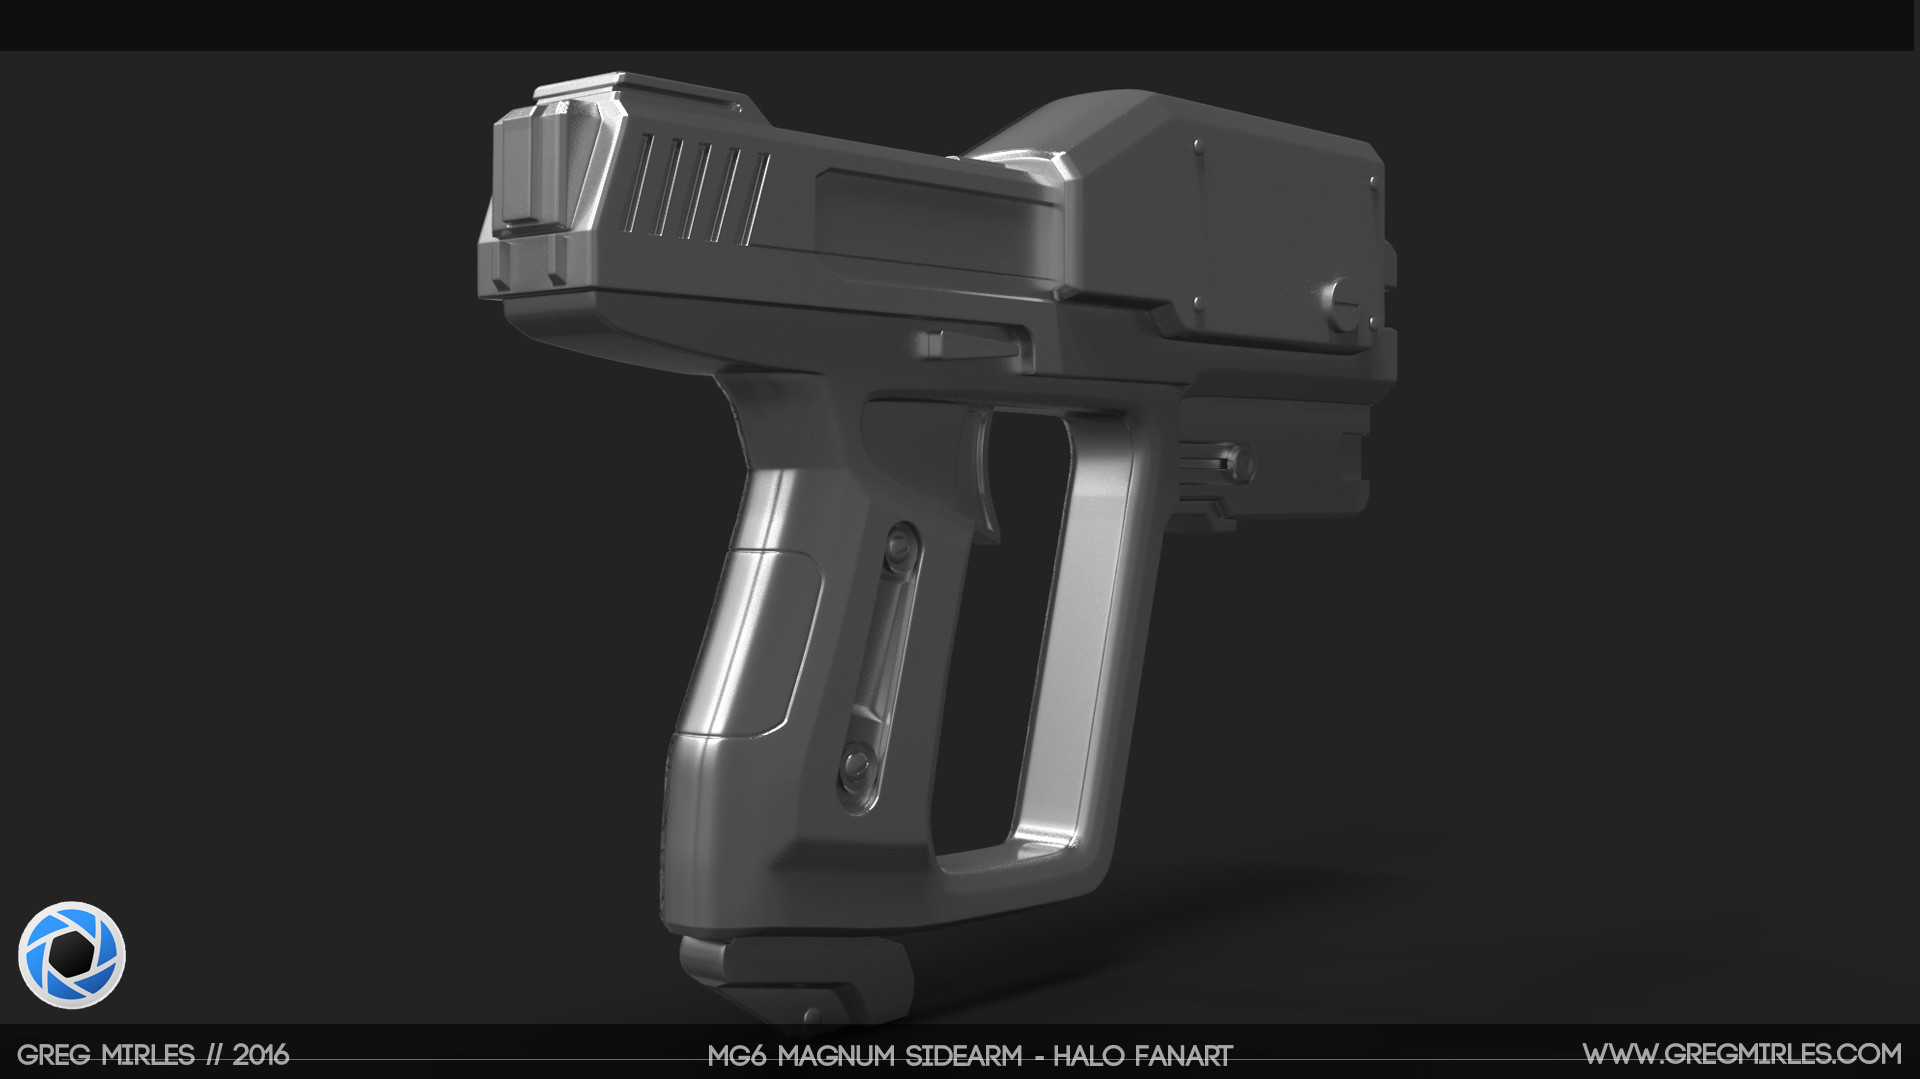 Greg mirles gun 03